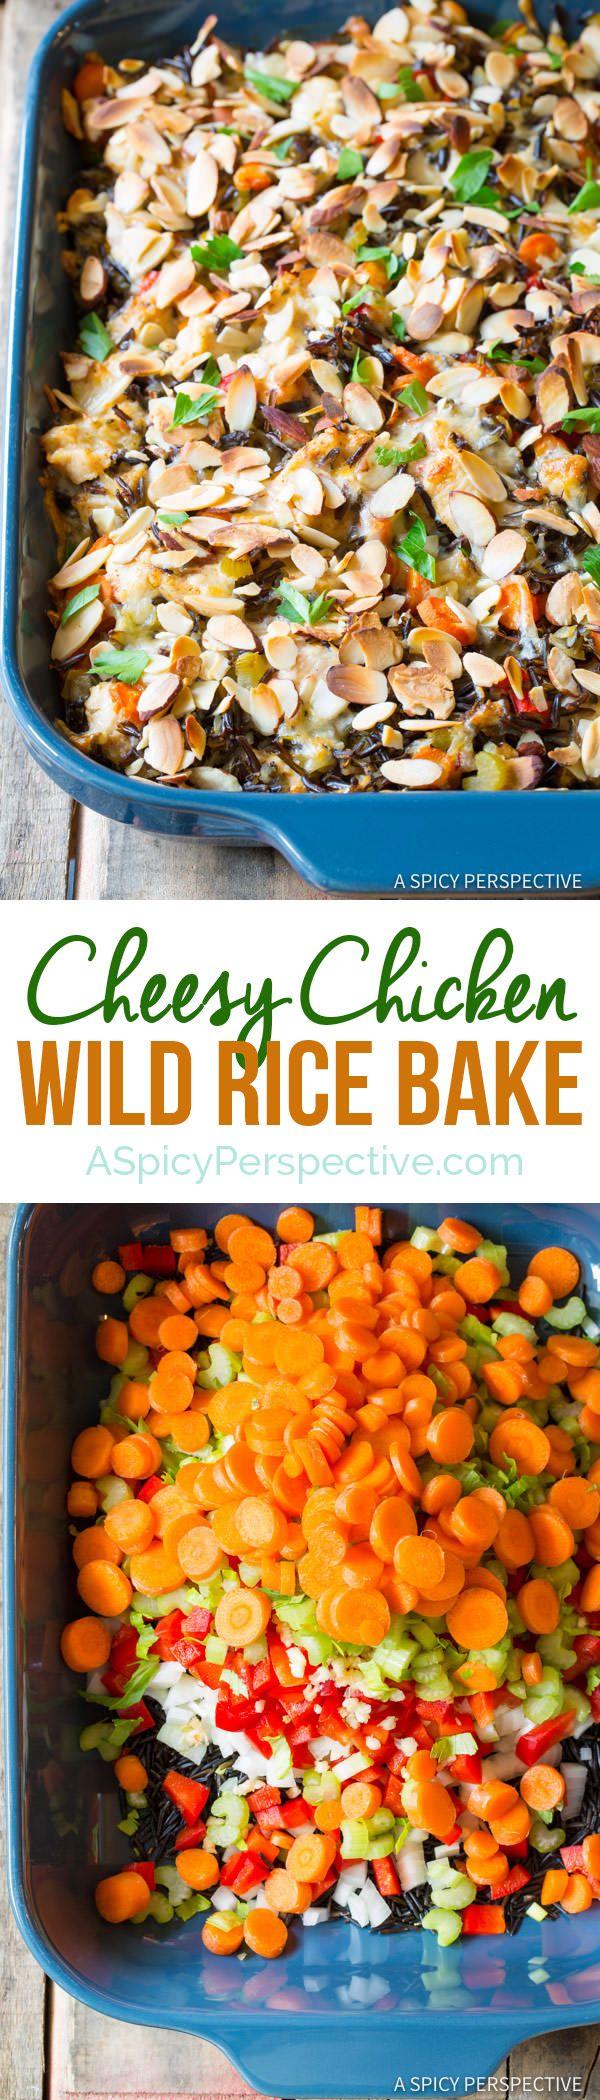 Hearty Cheesy Chicken Wild Rice Casserole | ASpicyPerspective.com